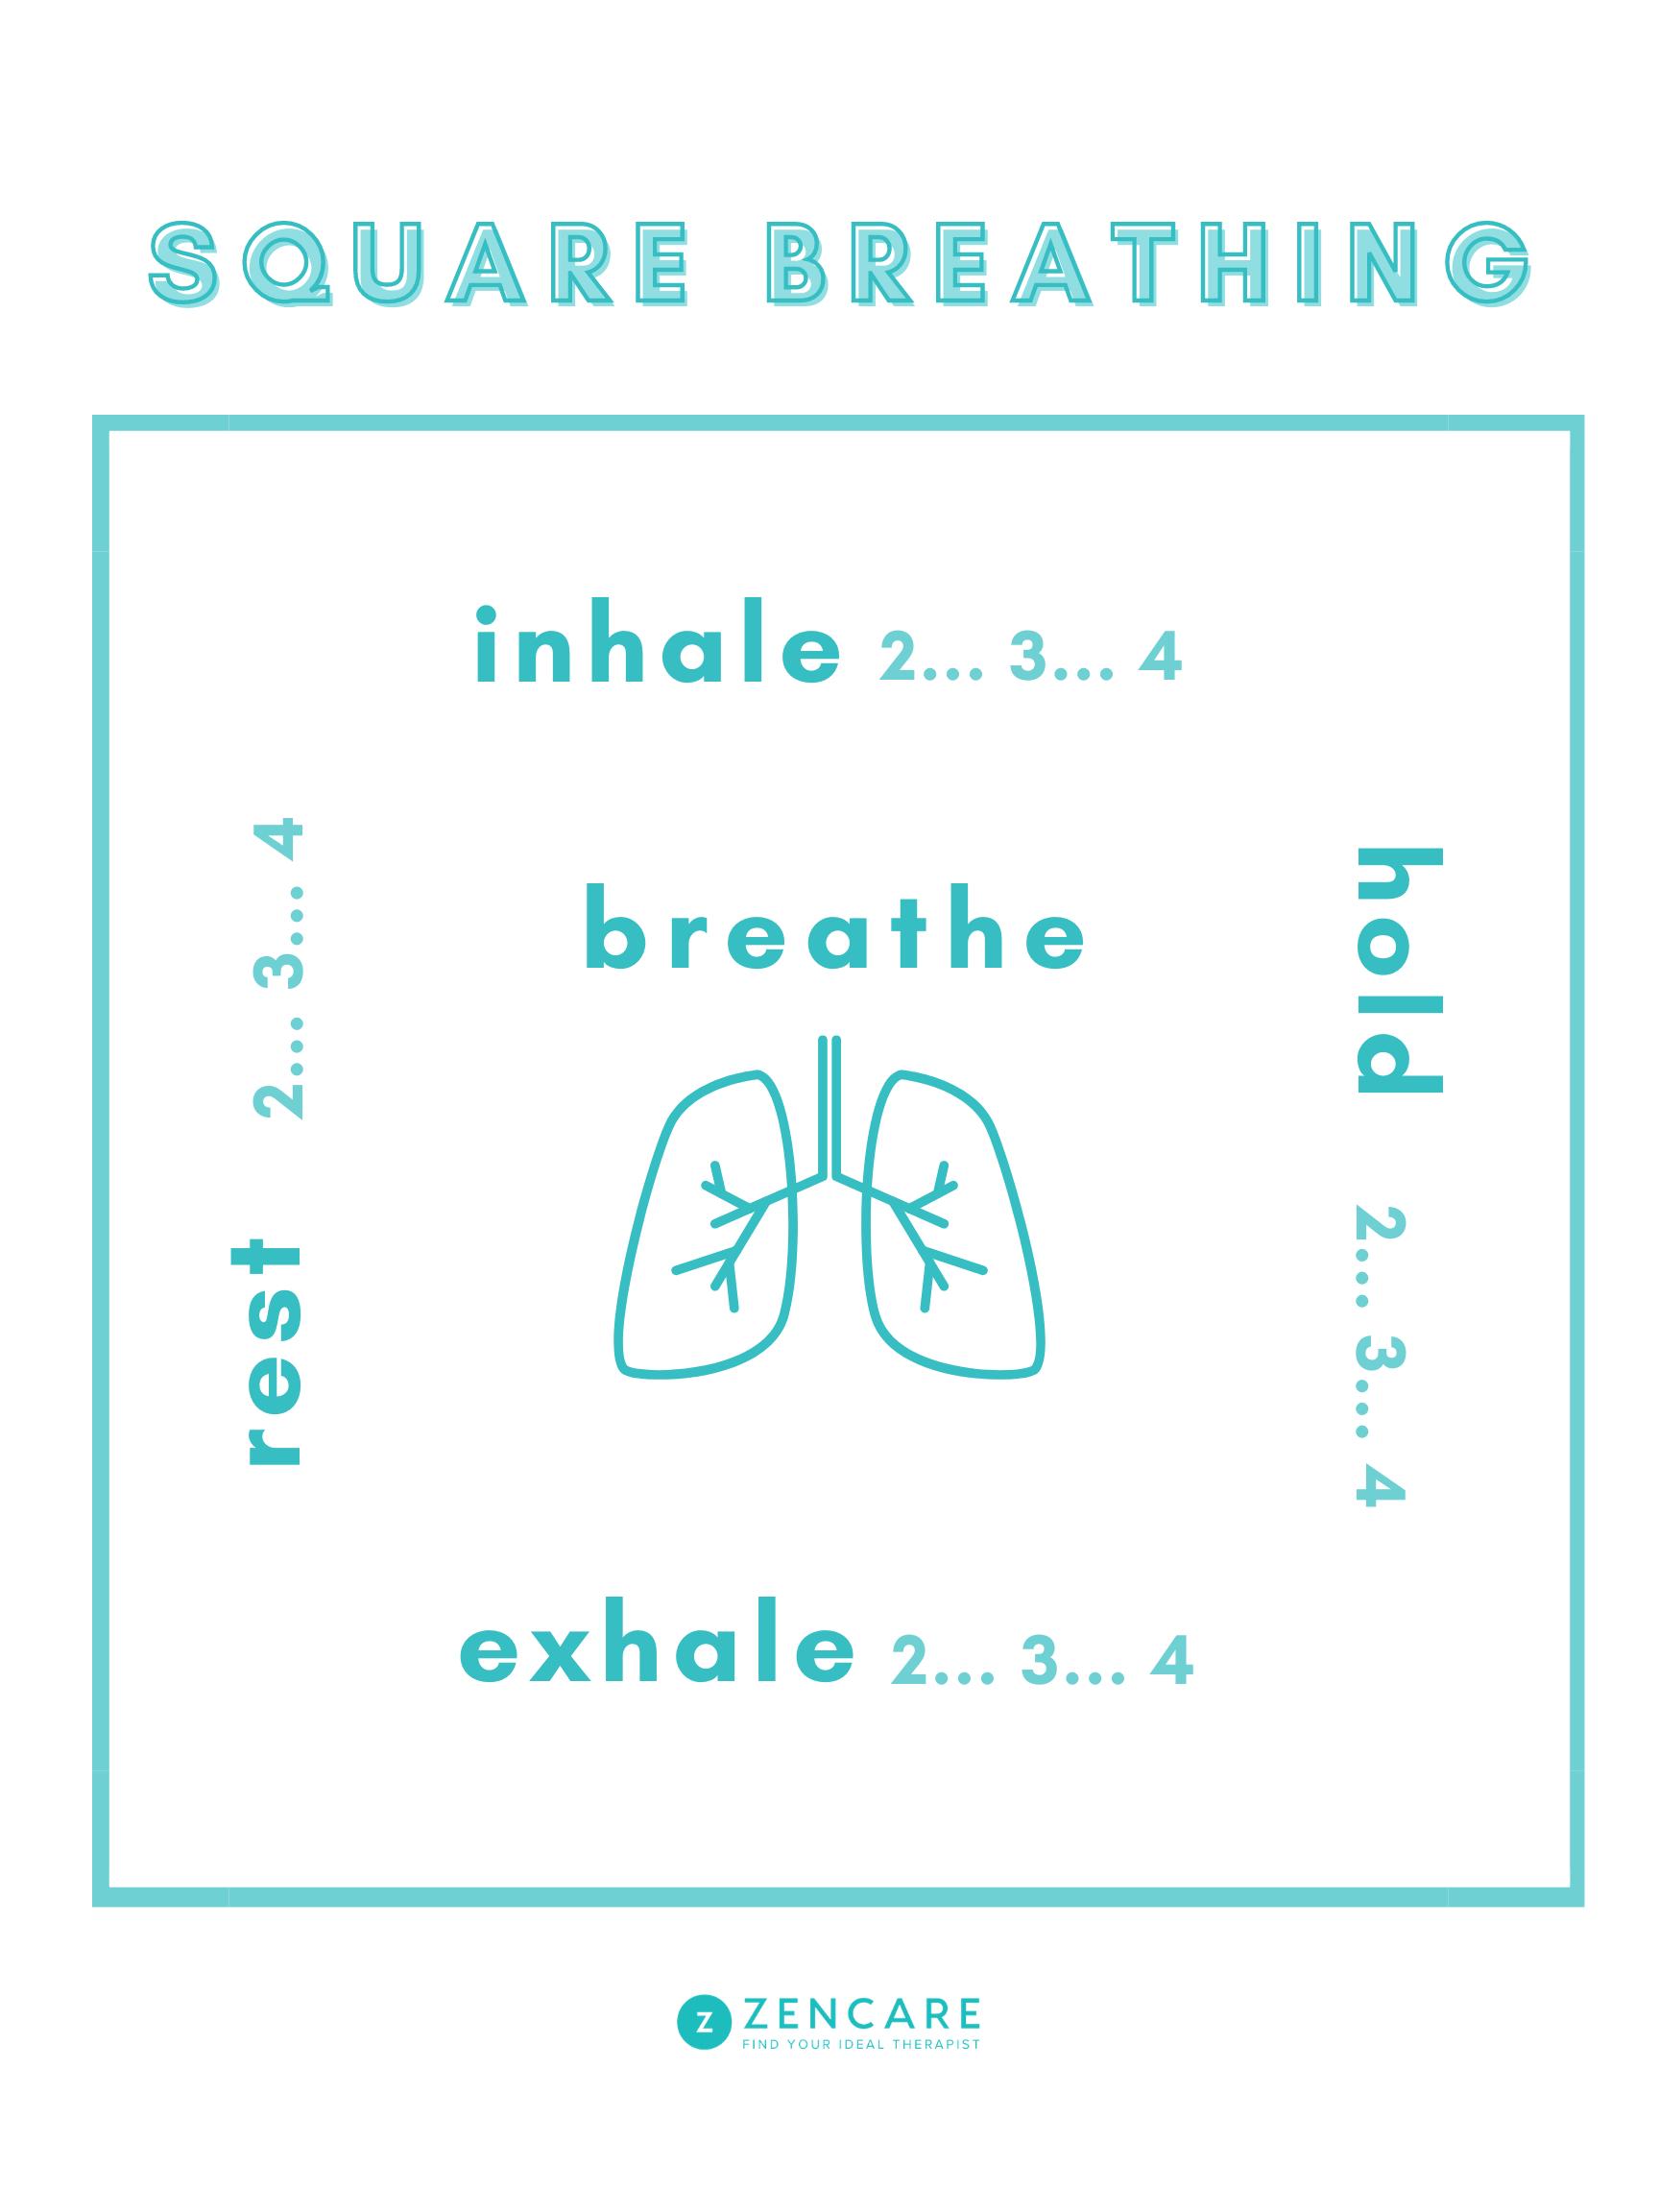 Square Breathing How to Reduce Stress through Breathwork   Zencare